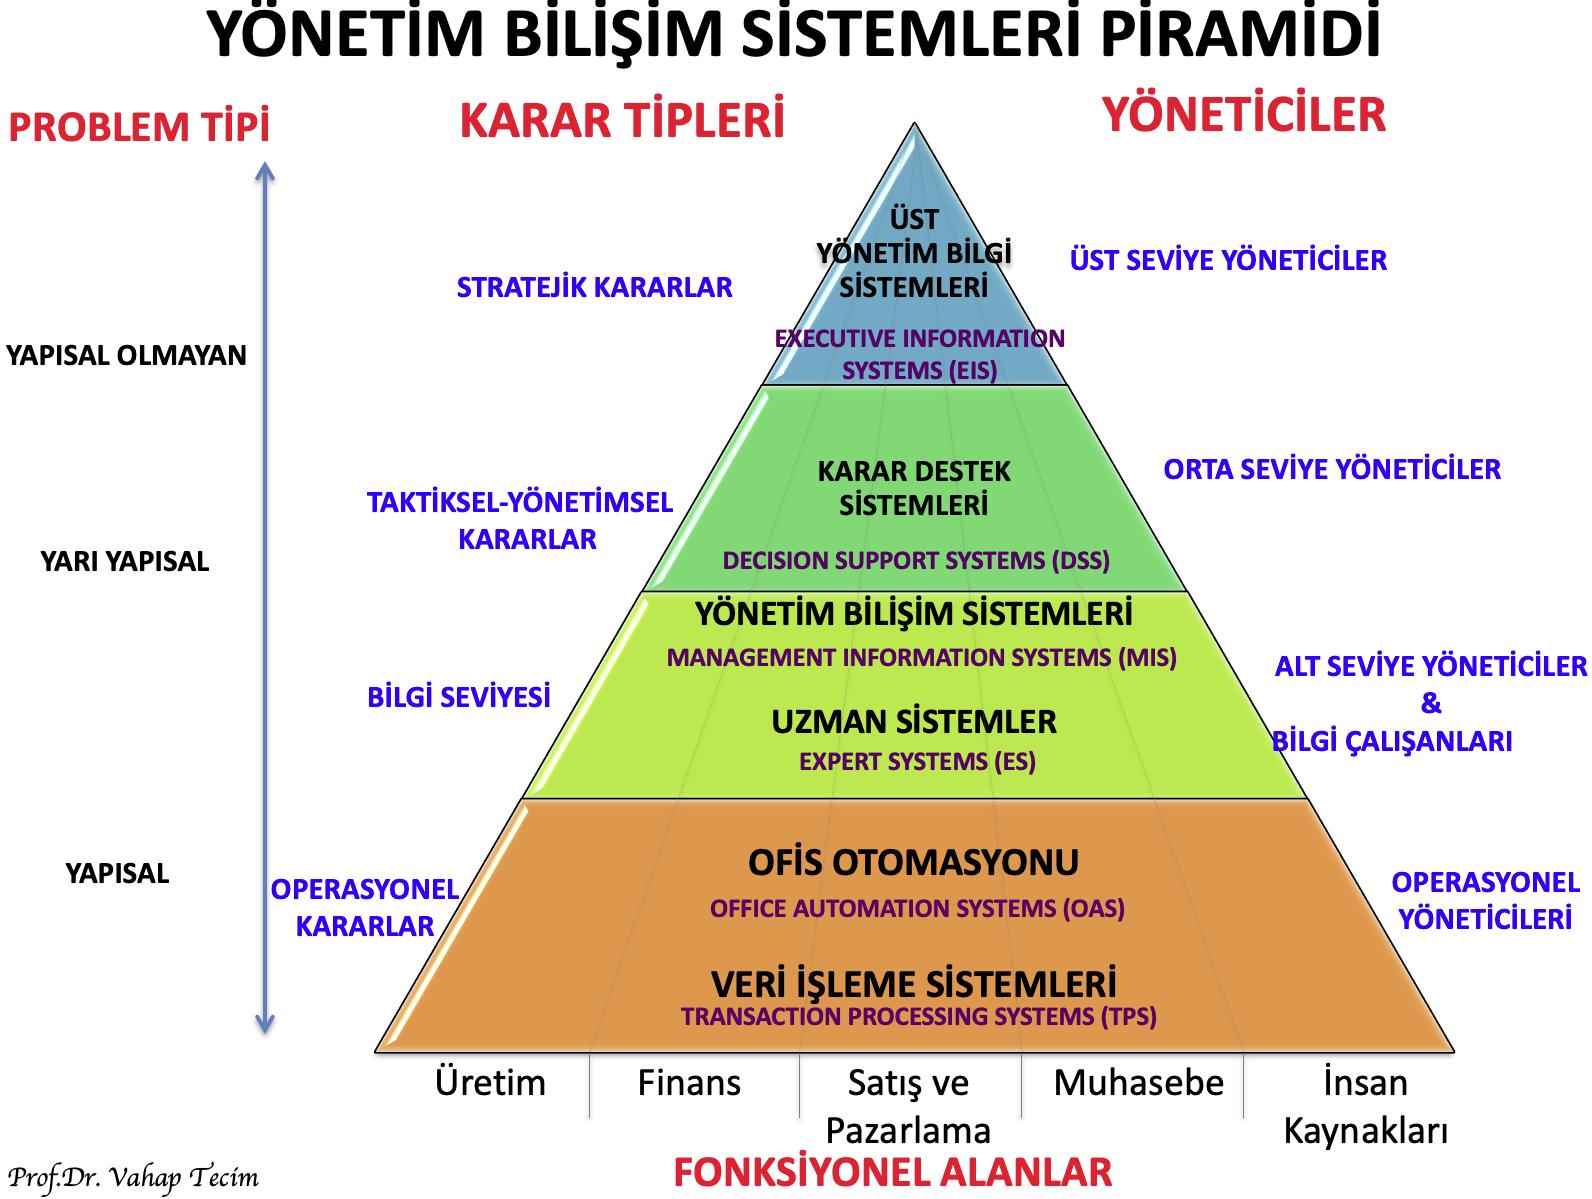 YBS Piramidi